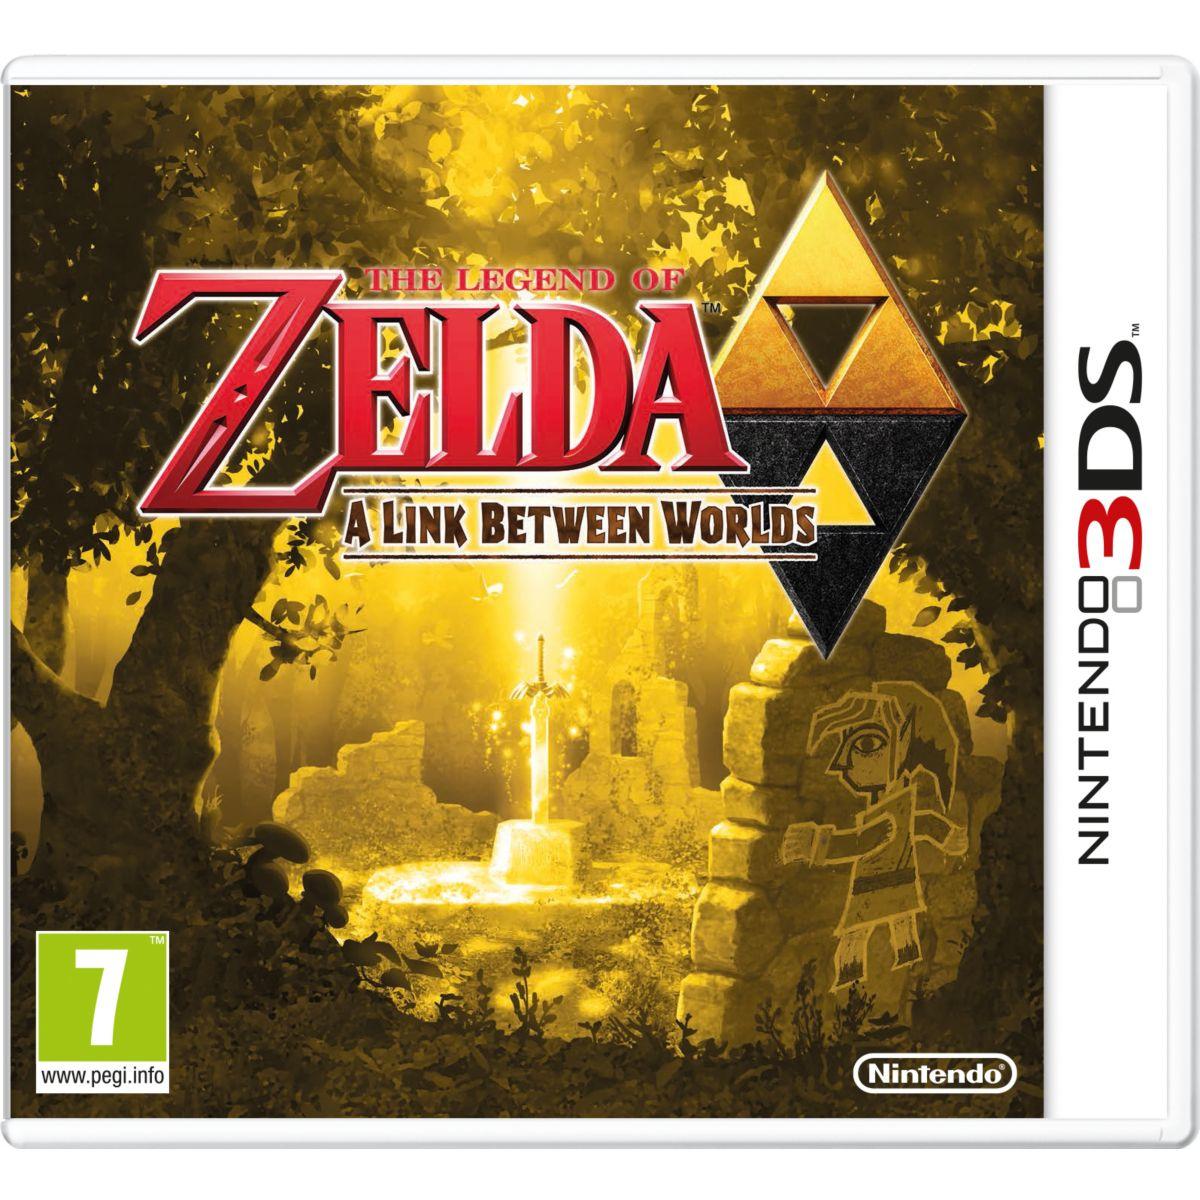 Jeu 3DS NINTENDO The Legend of Zelda A Link Between World Selects (photo)